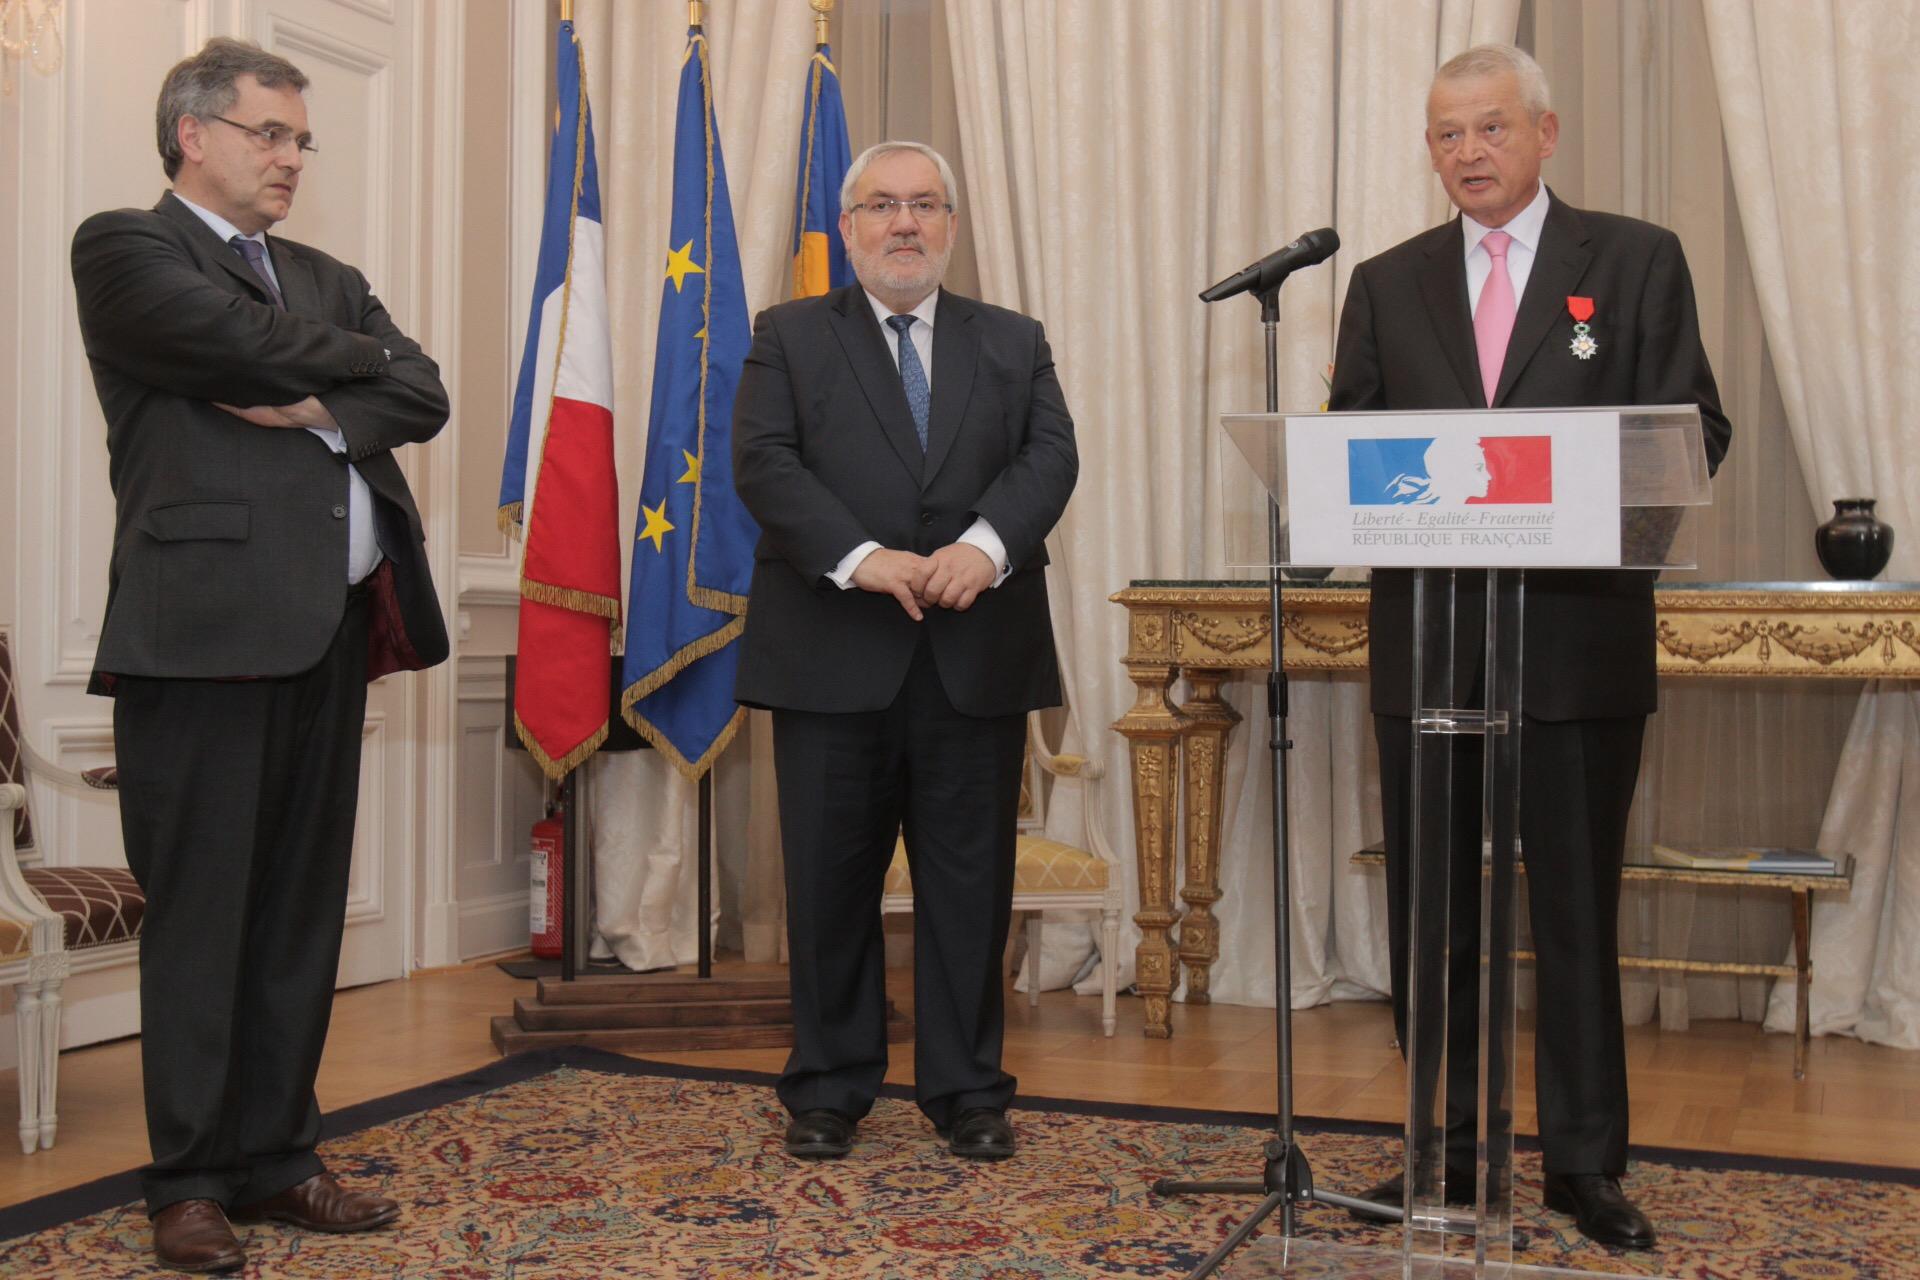 Primarul general Sorin Oprescu a primit cea mai inalta distinctie civila si militara franceza